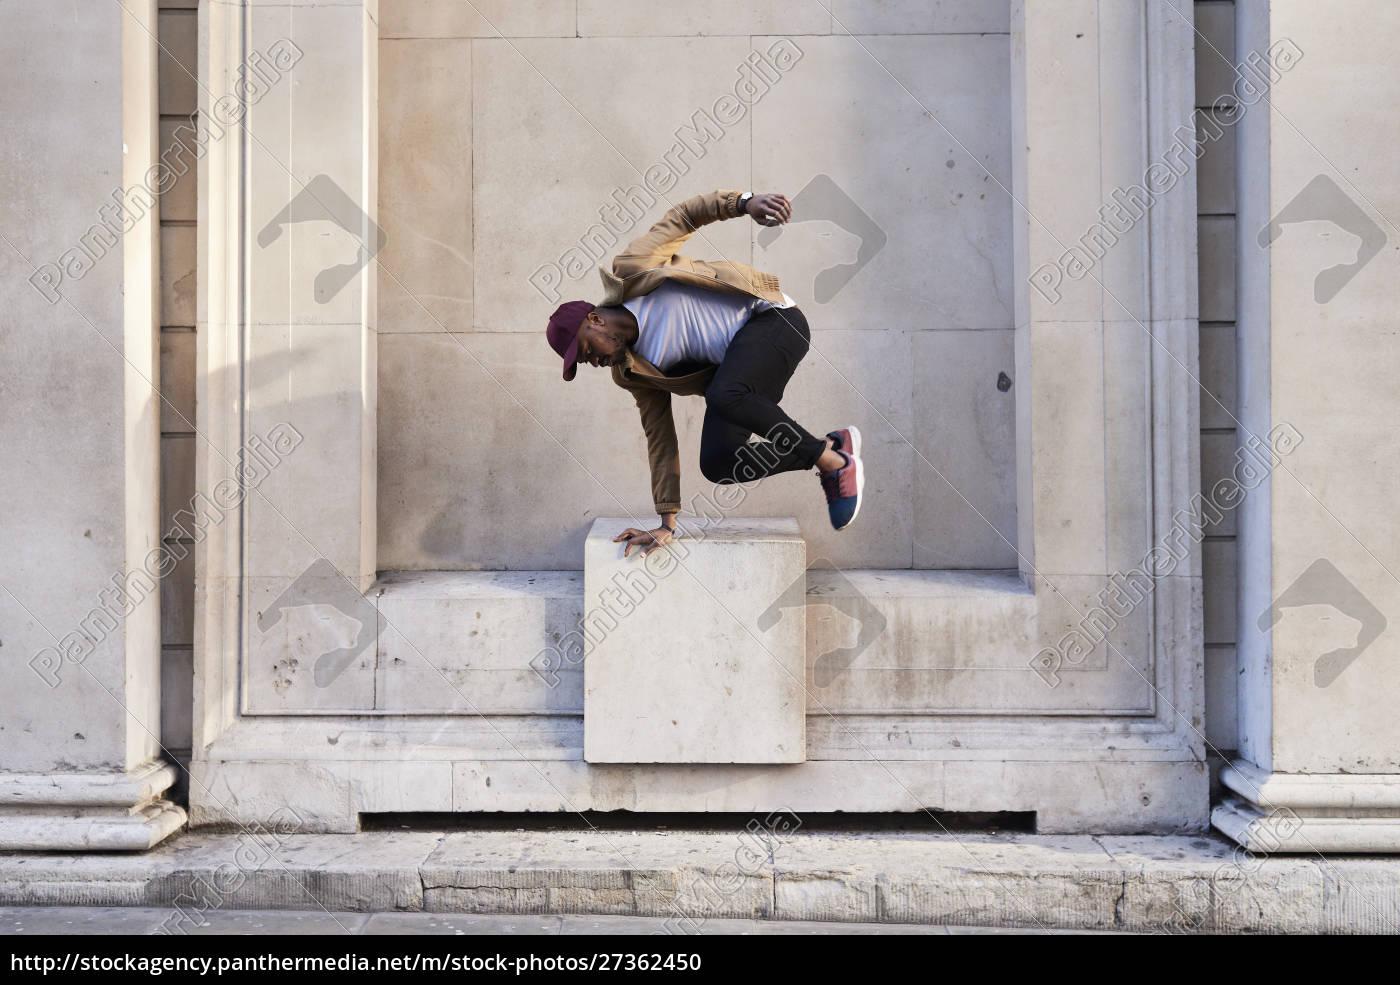 mid, adult, man, jumping - 27362450